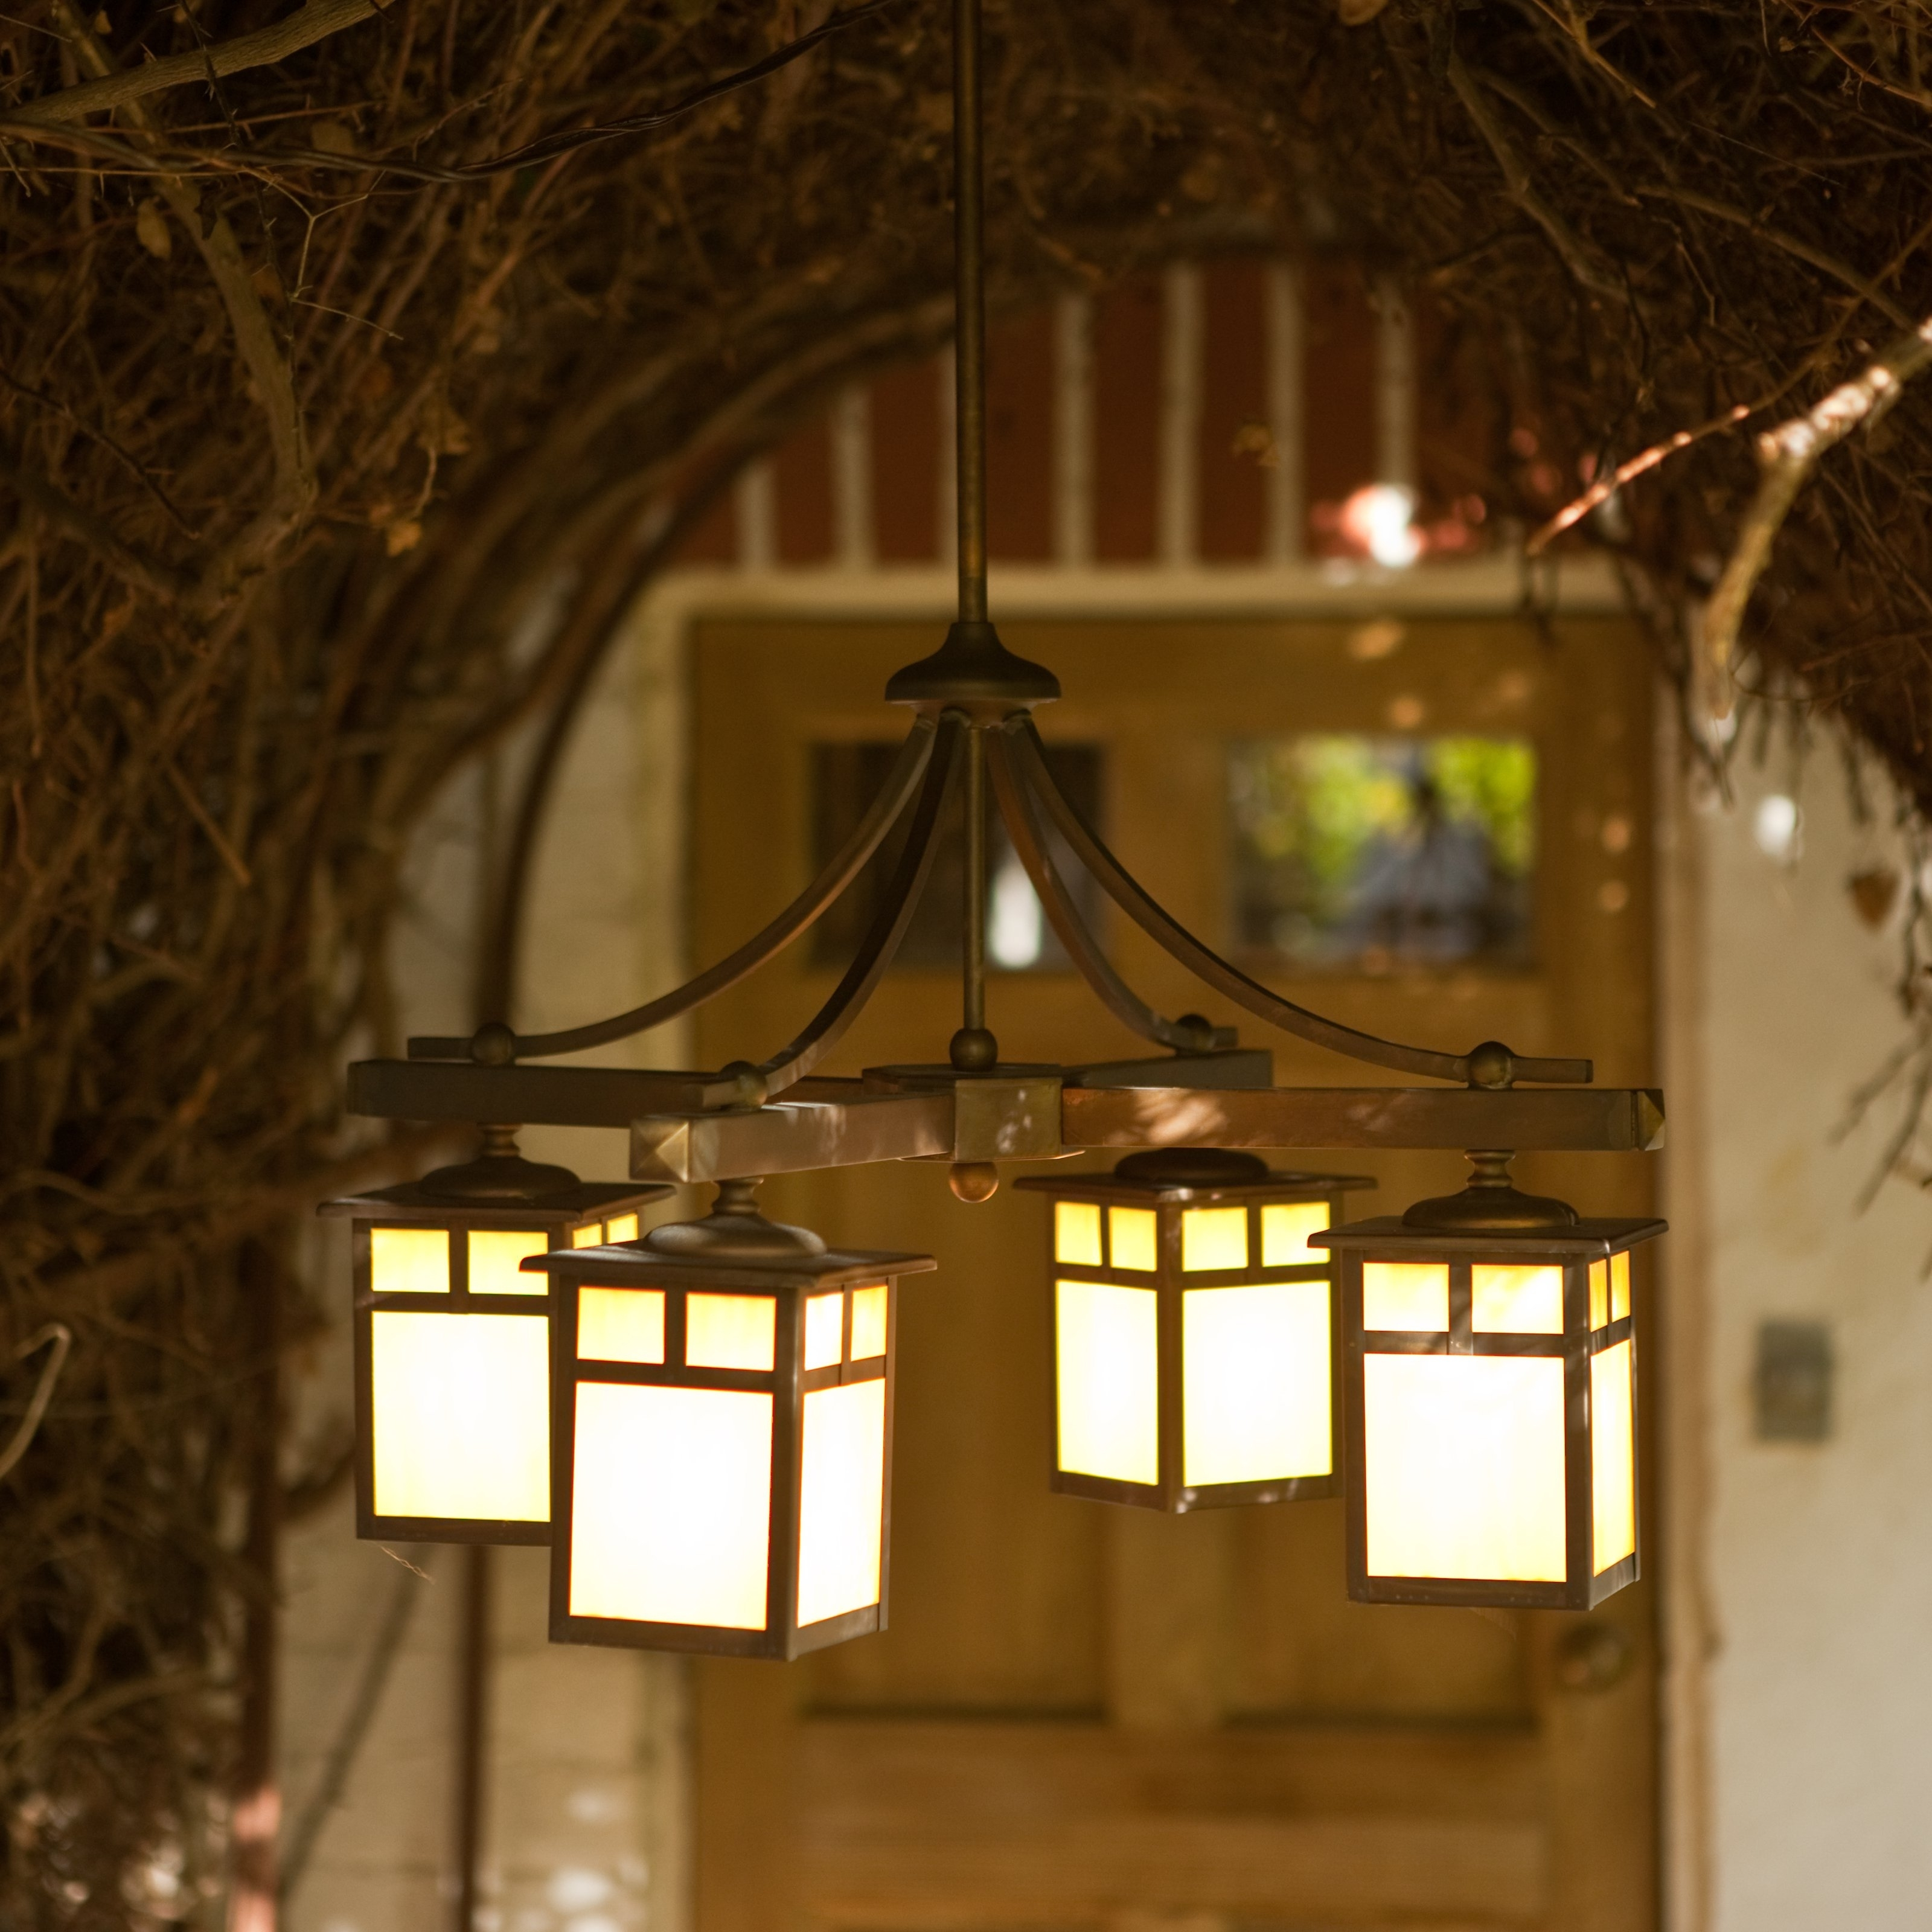 Outdoor Hanging Lights | Hayneedle For Outdoor Hanging Lights (View 15 of 15)